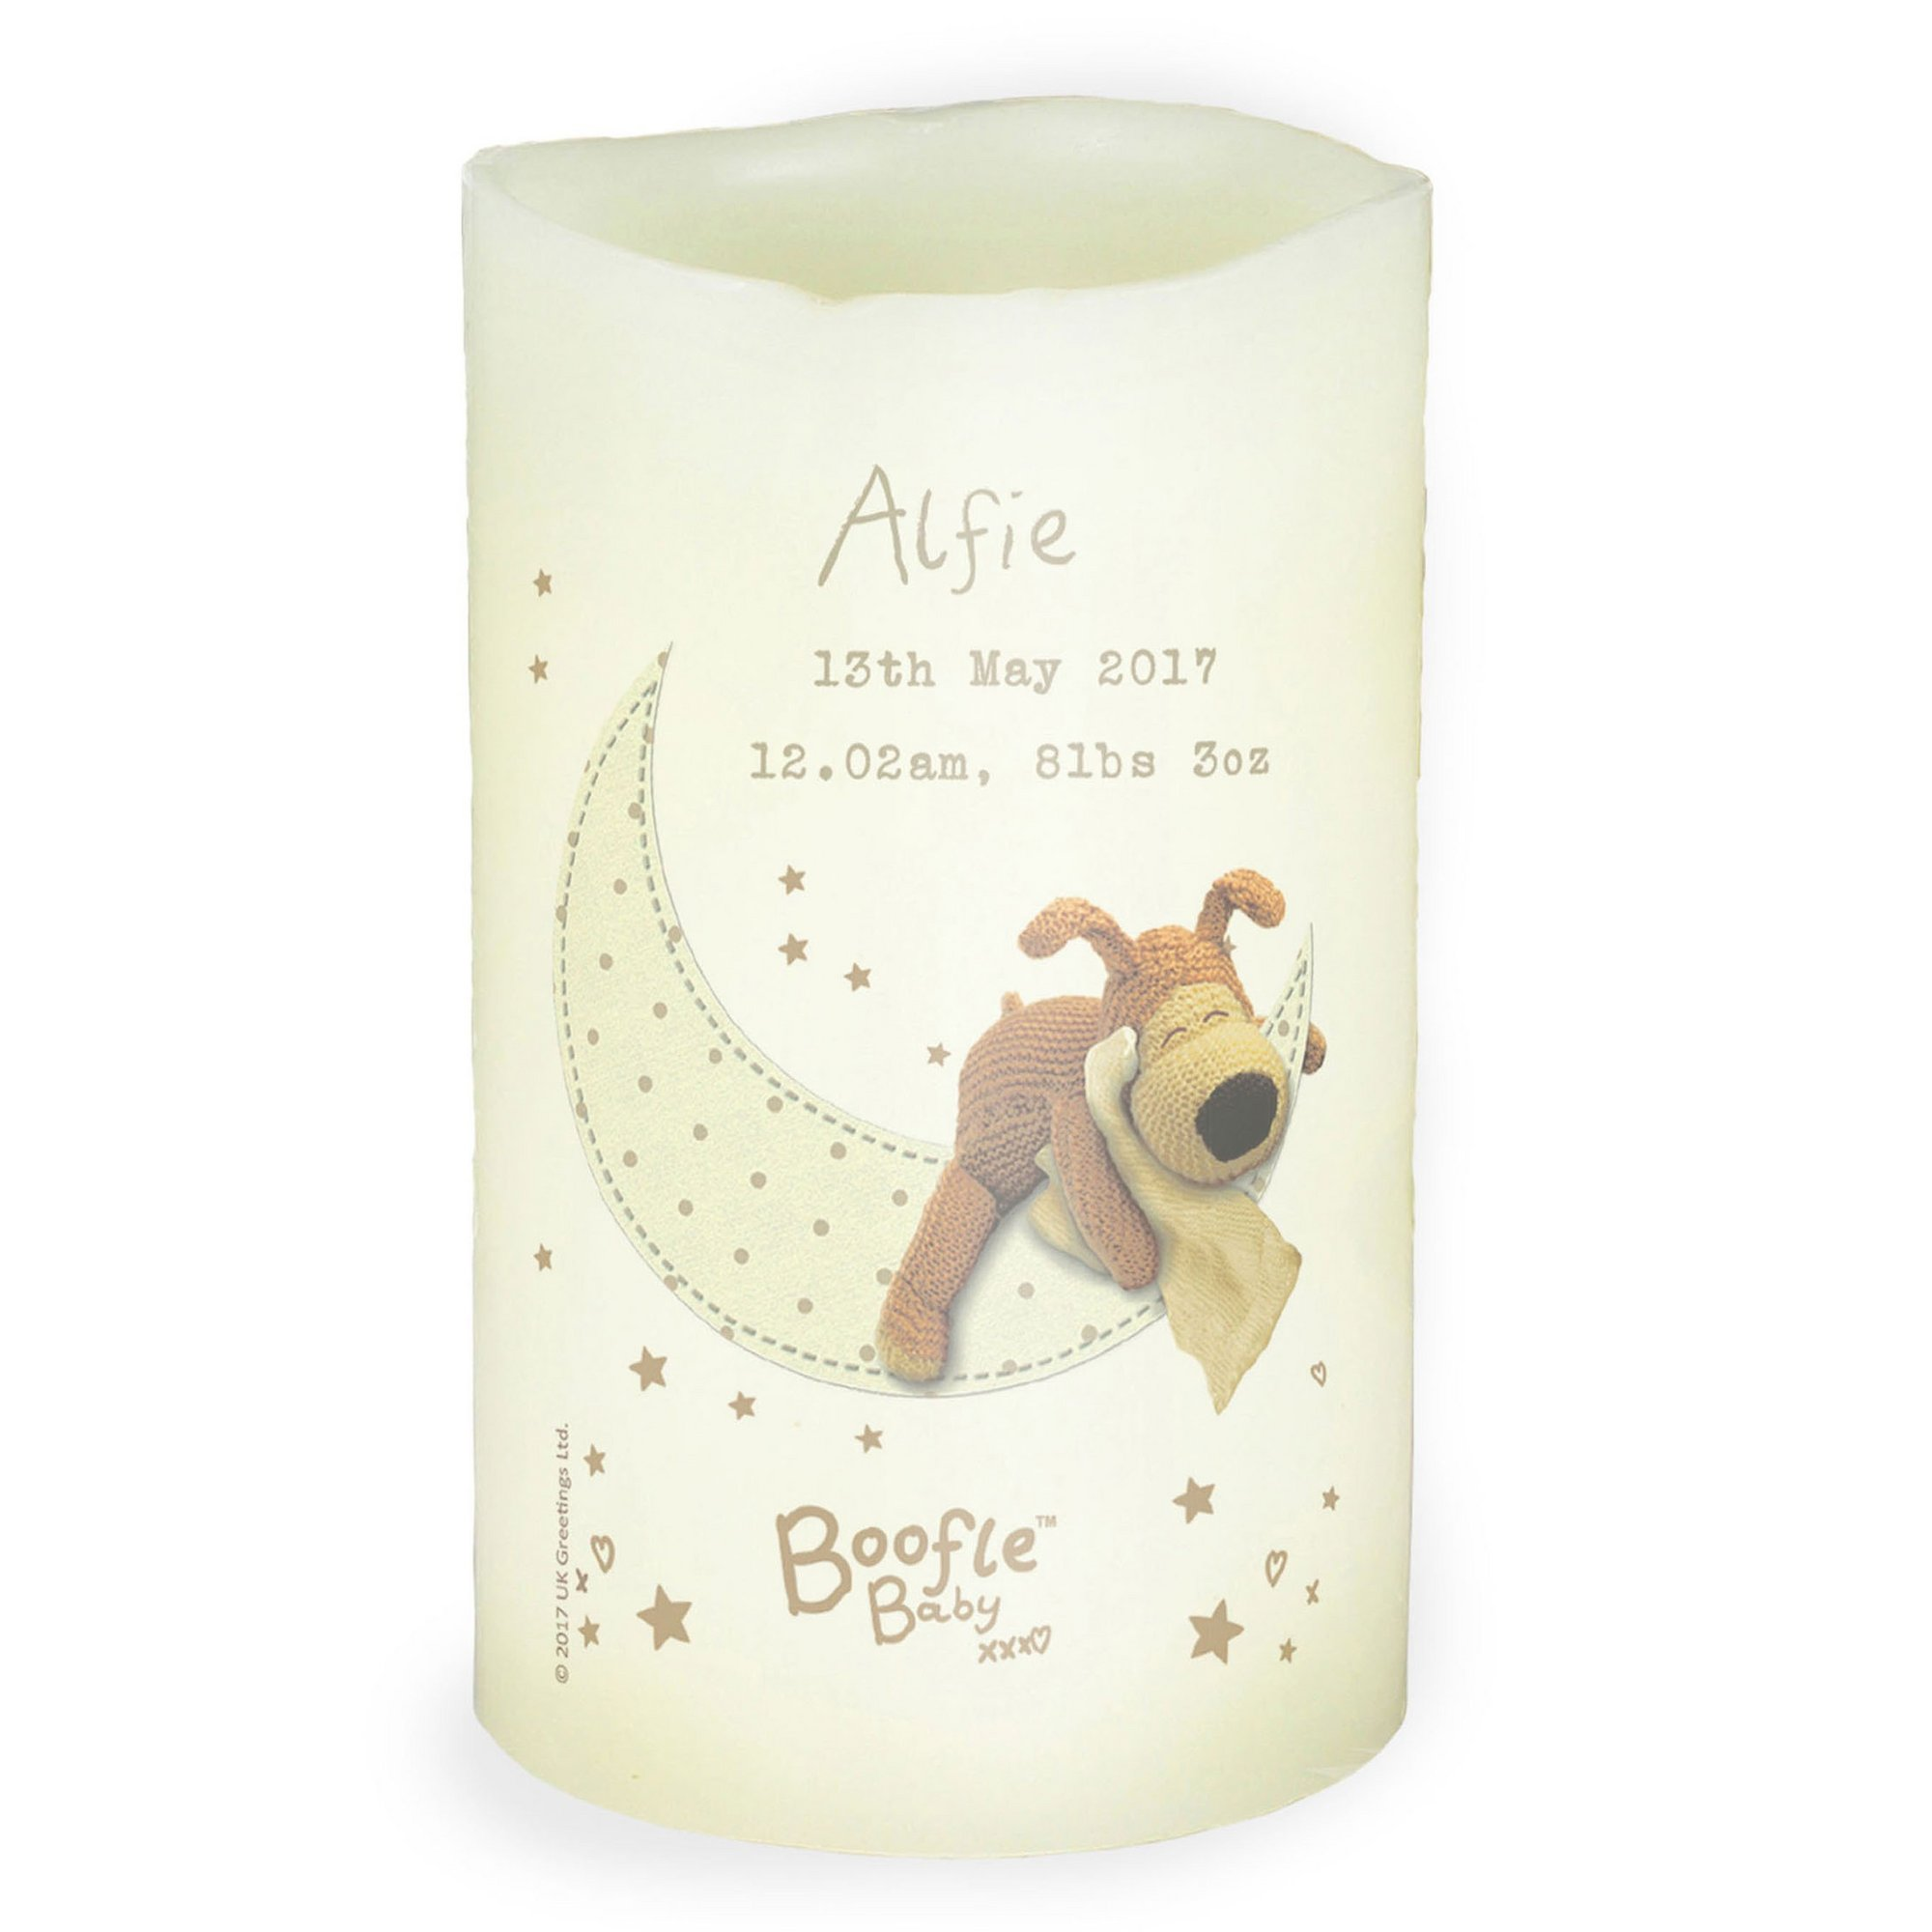 Image of Personalised Boofle Baby Nightlight LED Candle